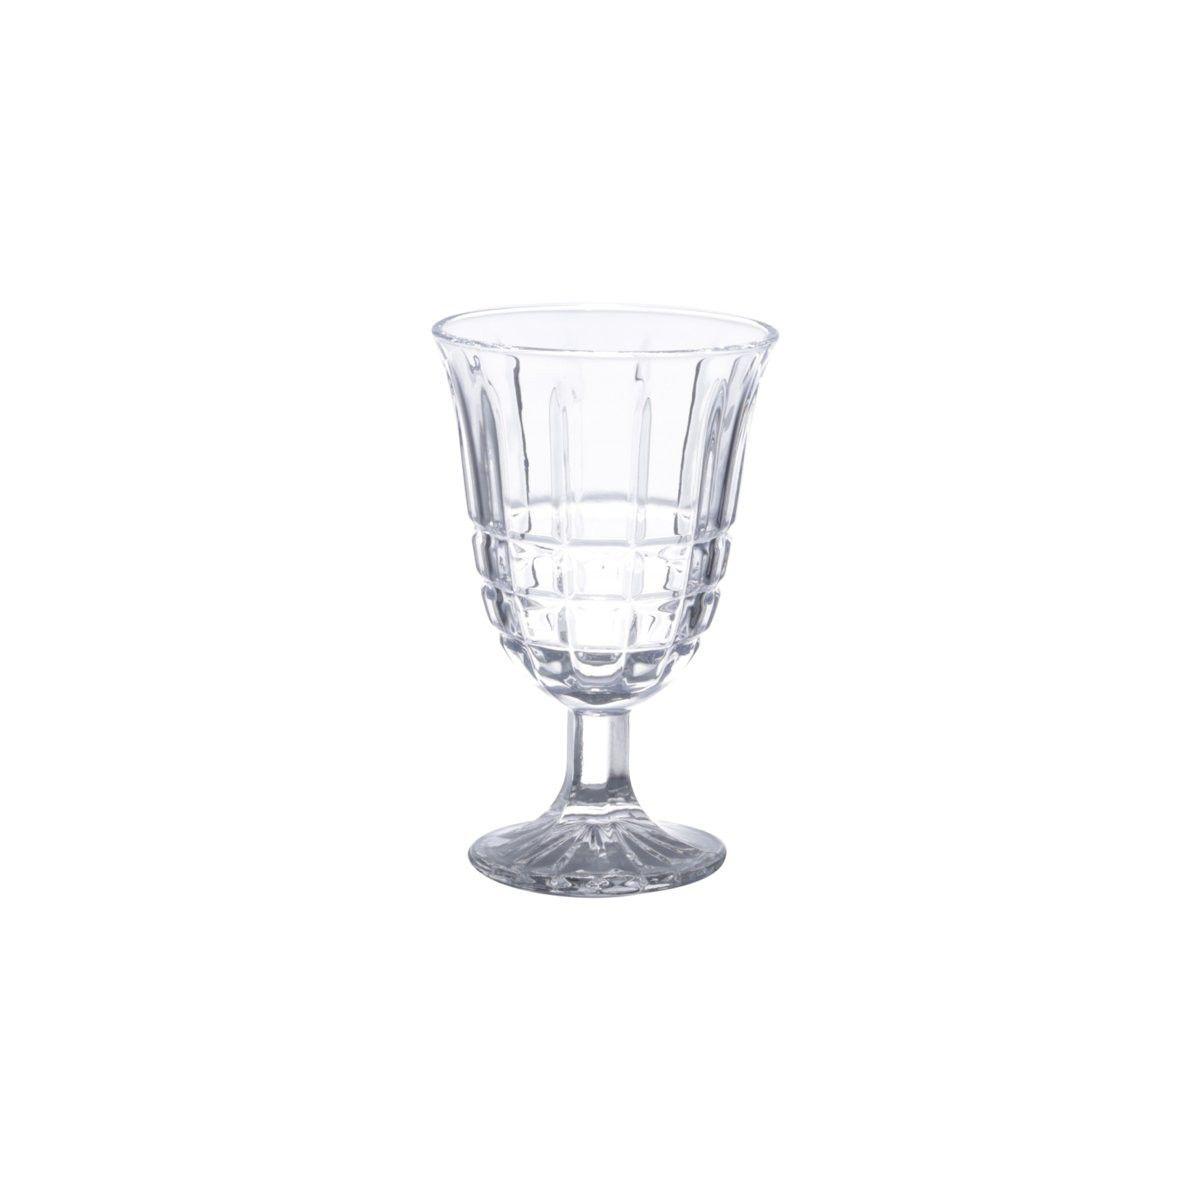 Conjunto 6 Taças De Vidro 250Ml Calcutá  - Lyor